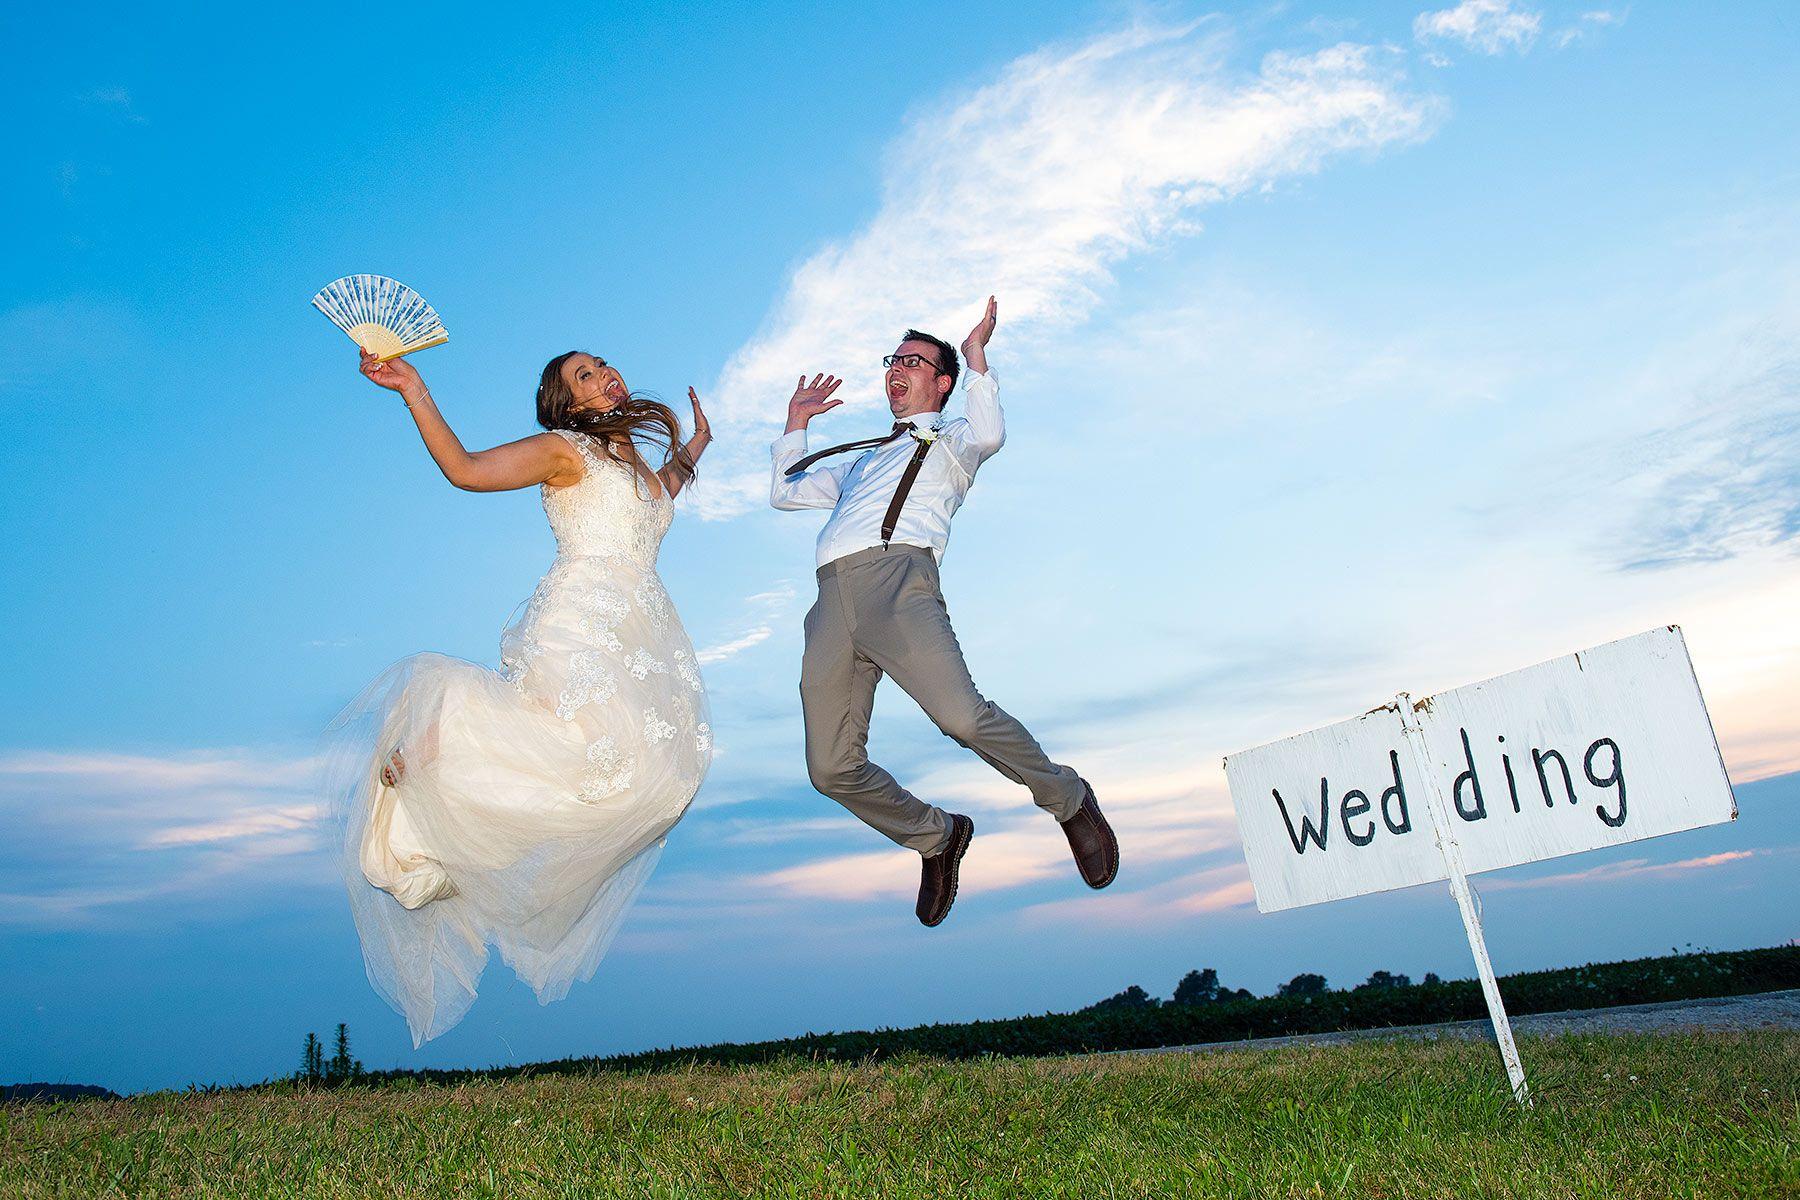 Couple's Delight Takes Flight